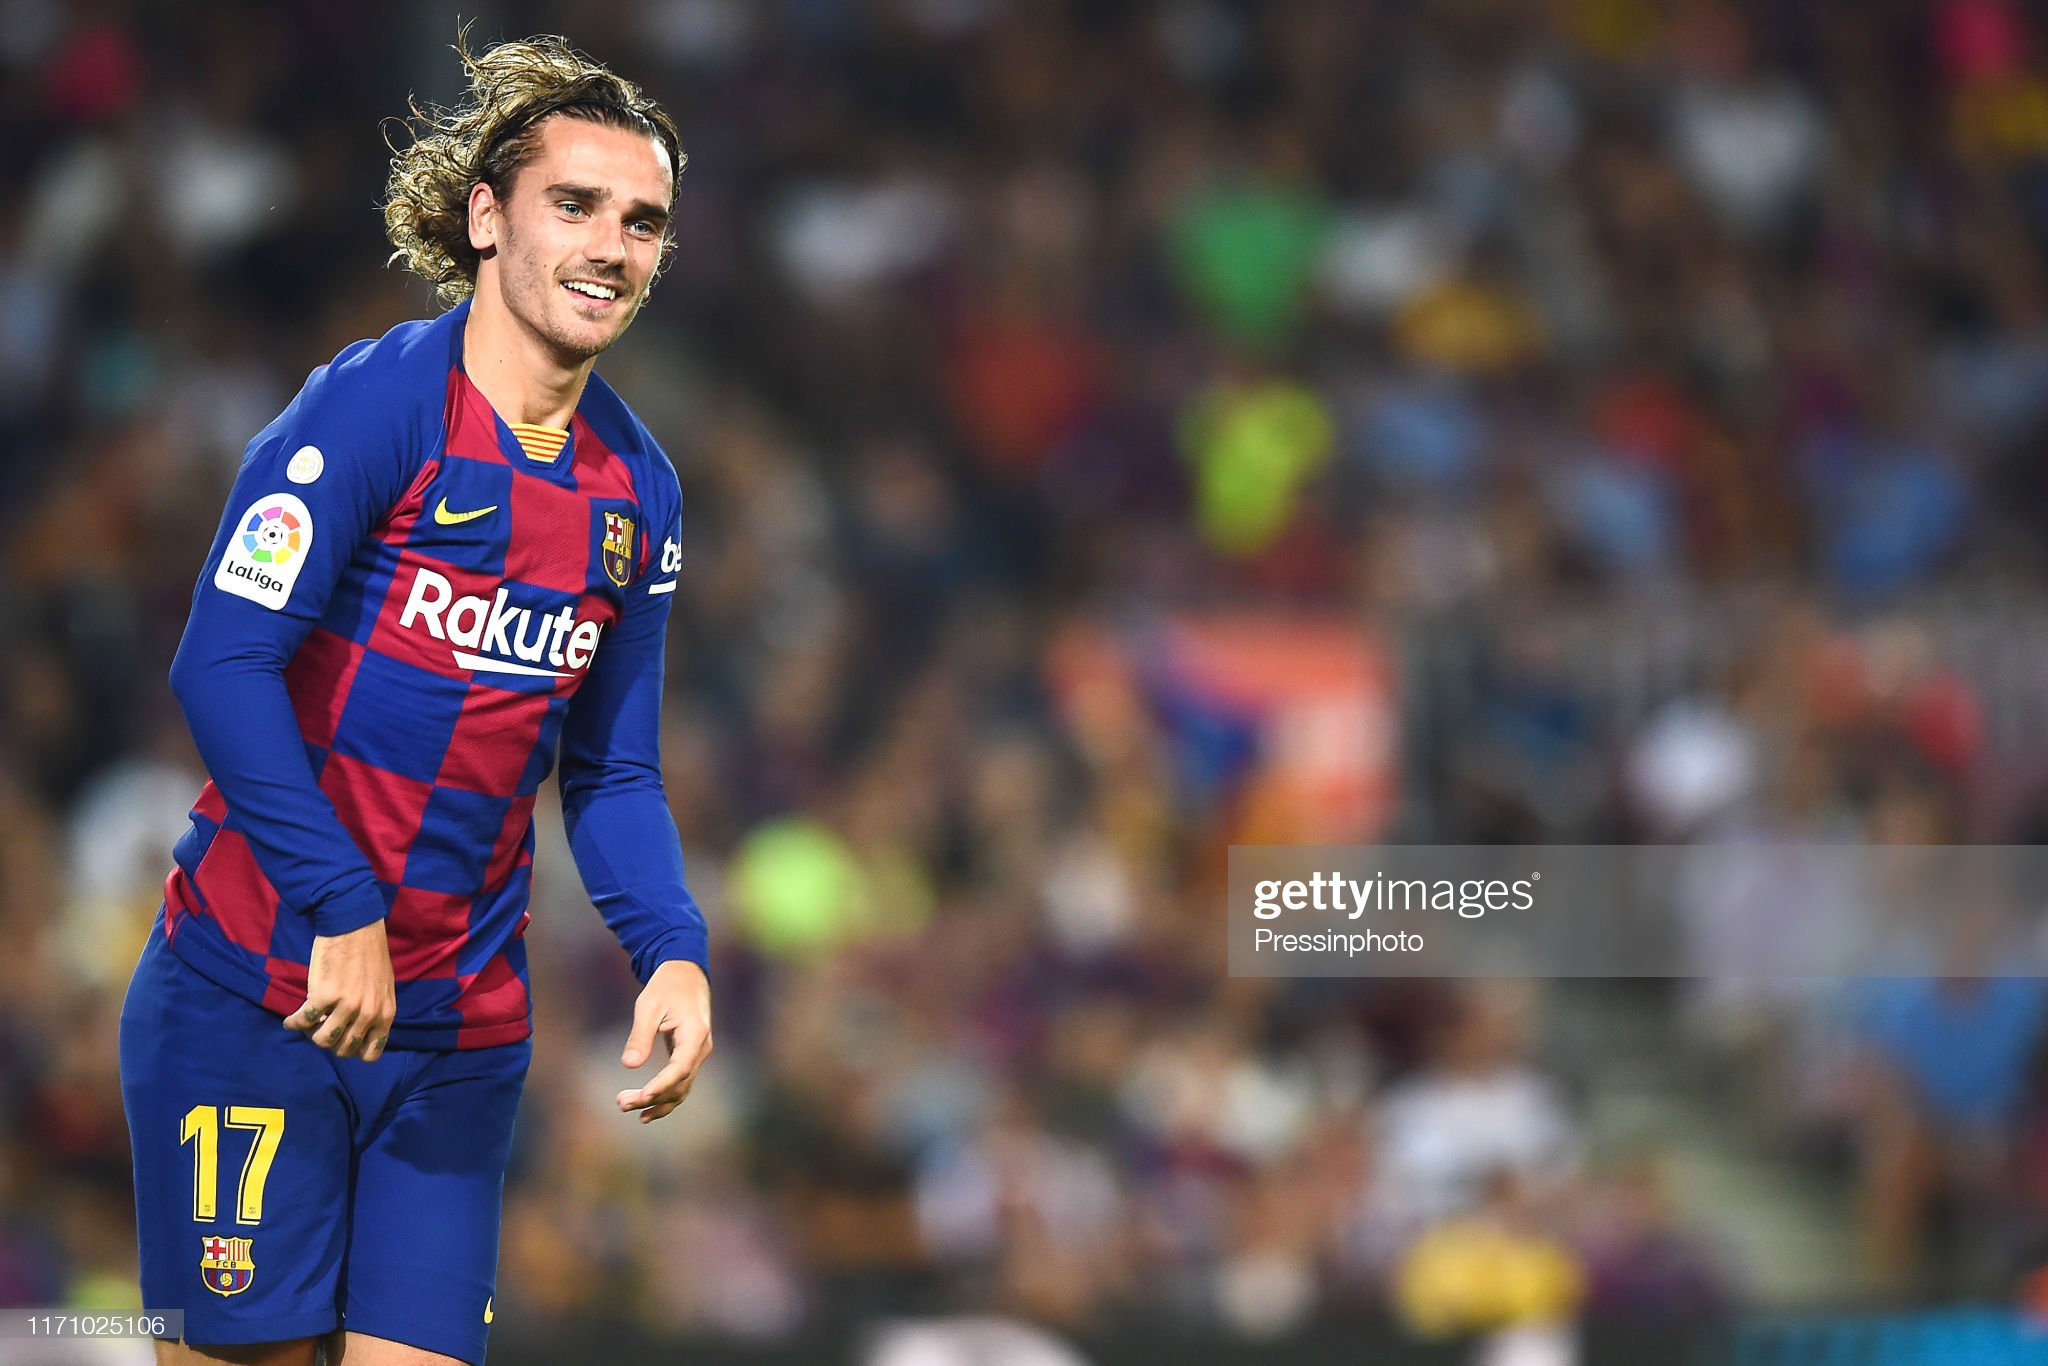 صور مباراة : برشلونة - فياريال 2-1 ( 24-09-2019 )  Antoine-griezmann-of-fc-barcelona-during-the-liga-match-between-and-picture-id1171025106?s=2048x2048